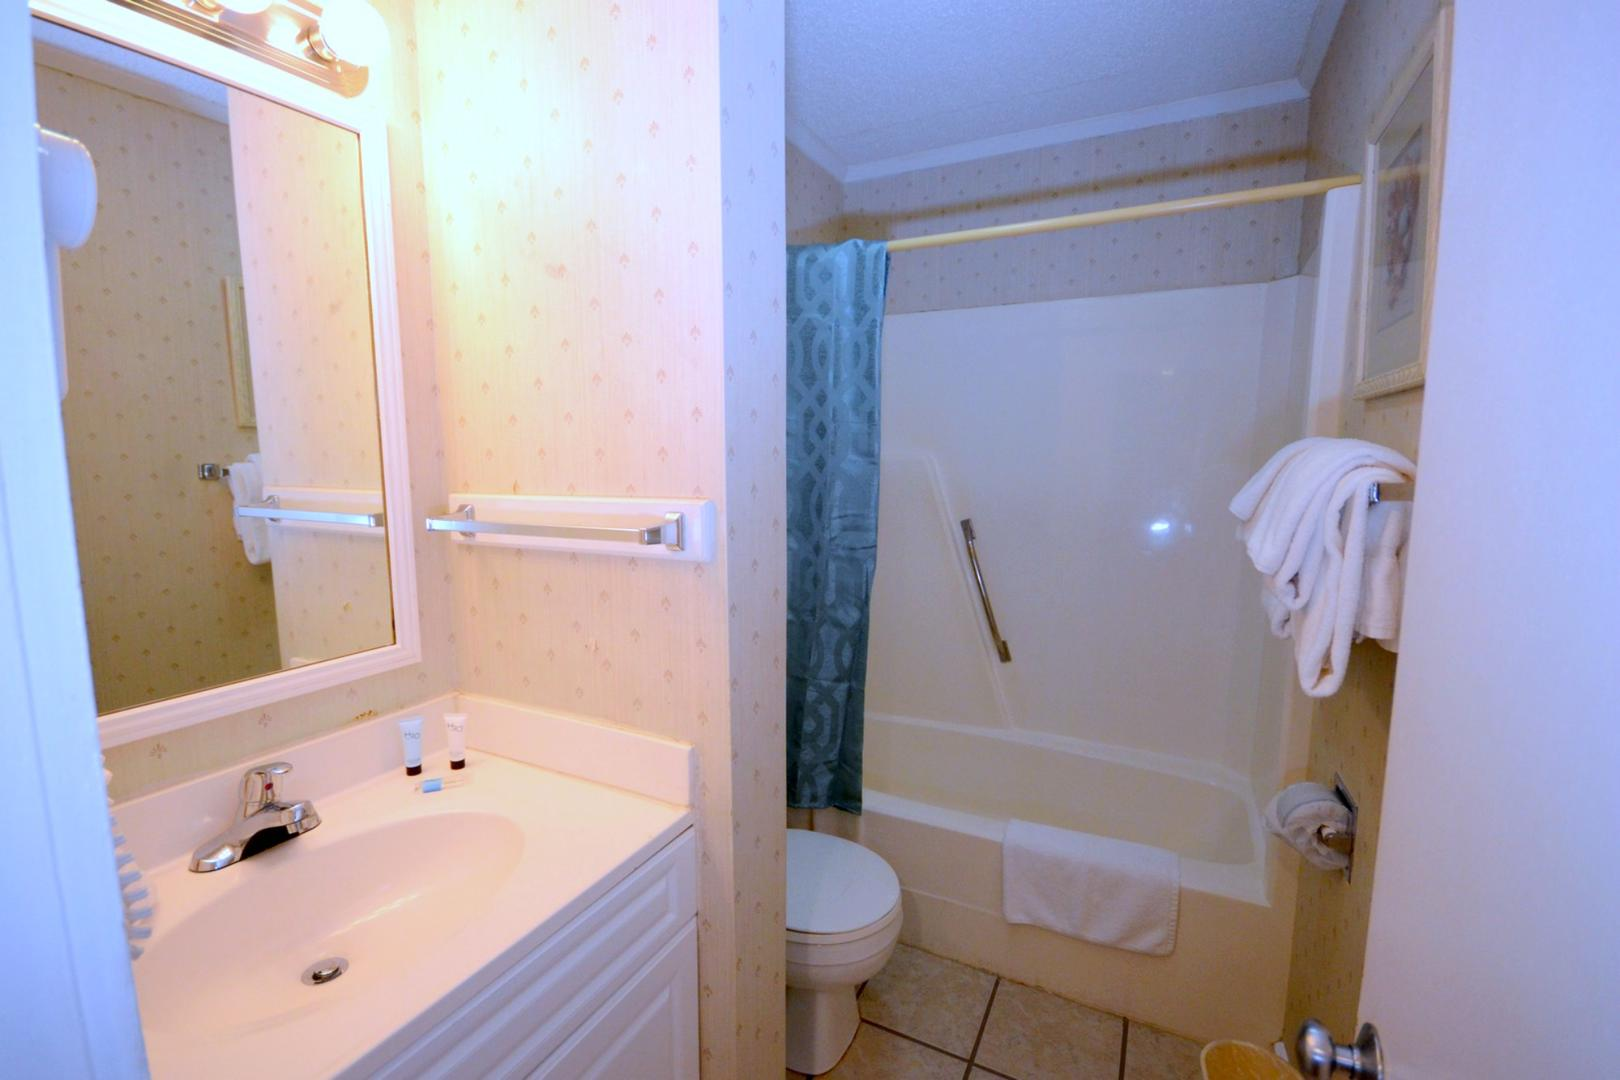 Ocean Creek L2256 - Bathroom 2